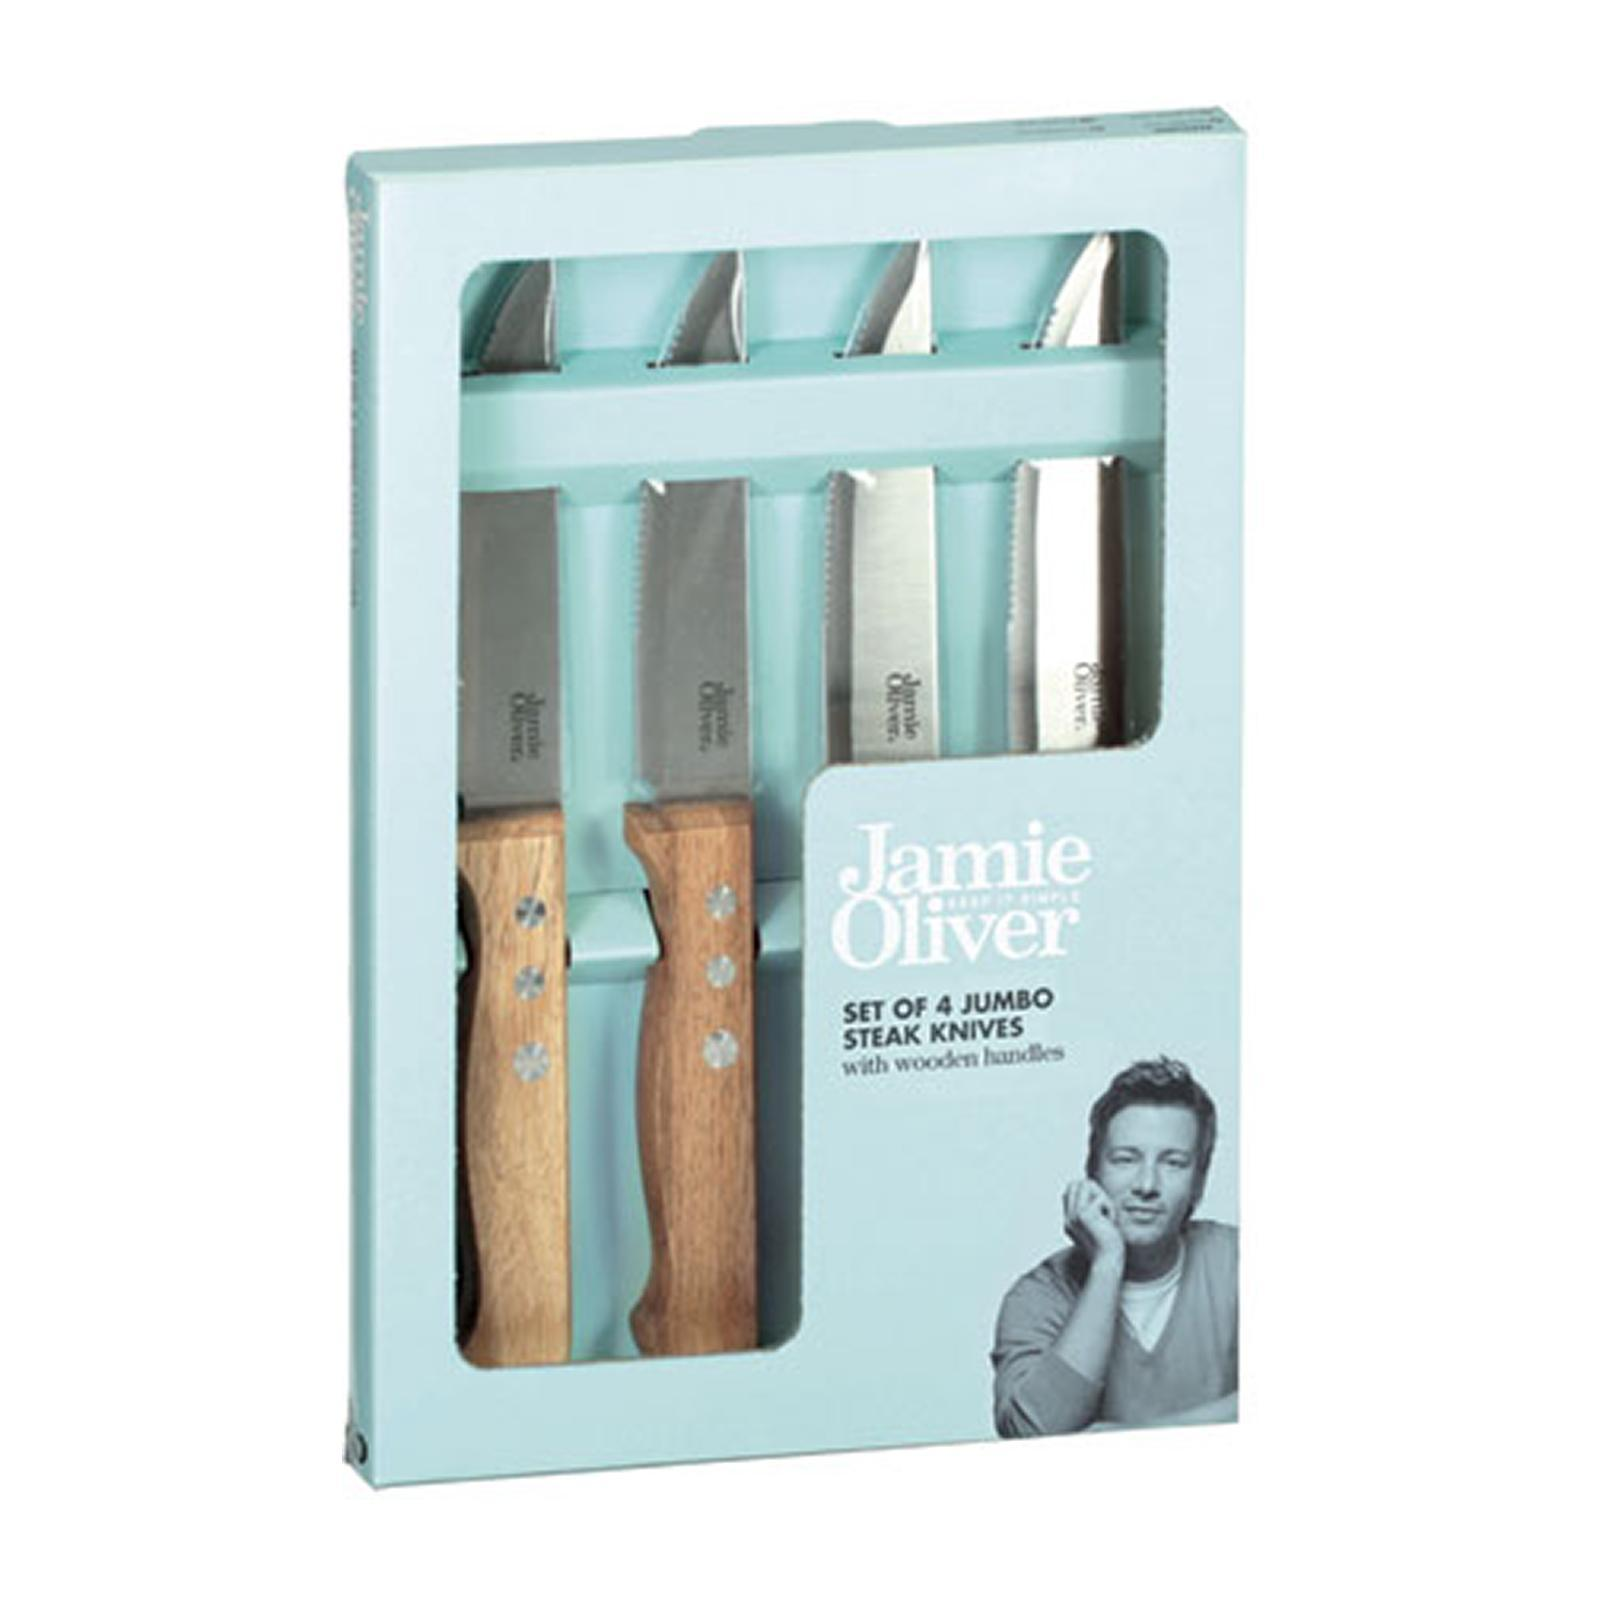 Jamie Oliver Jumbo Steak Knives With Wooden Handles - Set Of 4 By Redmart.